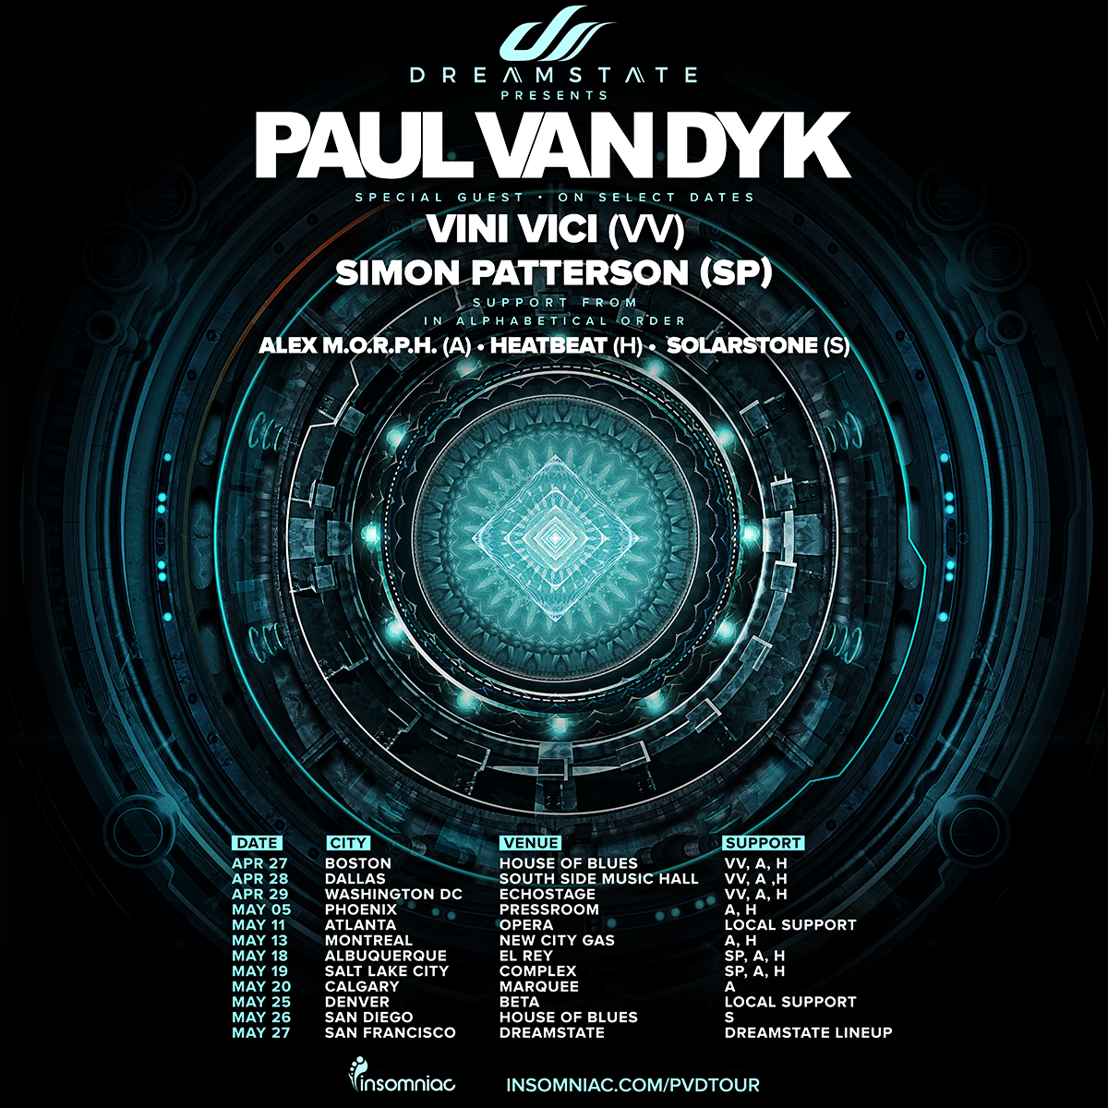 Paul van Dyk Announces U.S Tour - Powered by Insomniac's Dreamstate Trance Brand